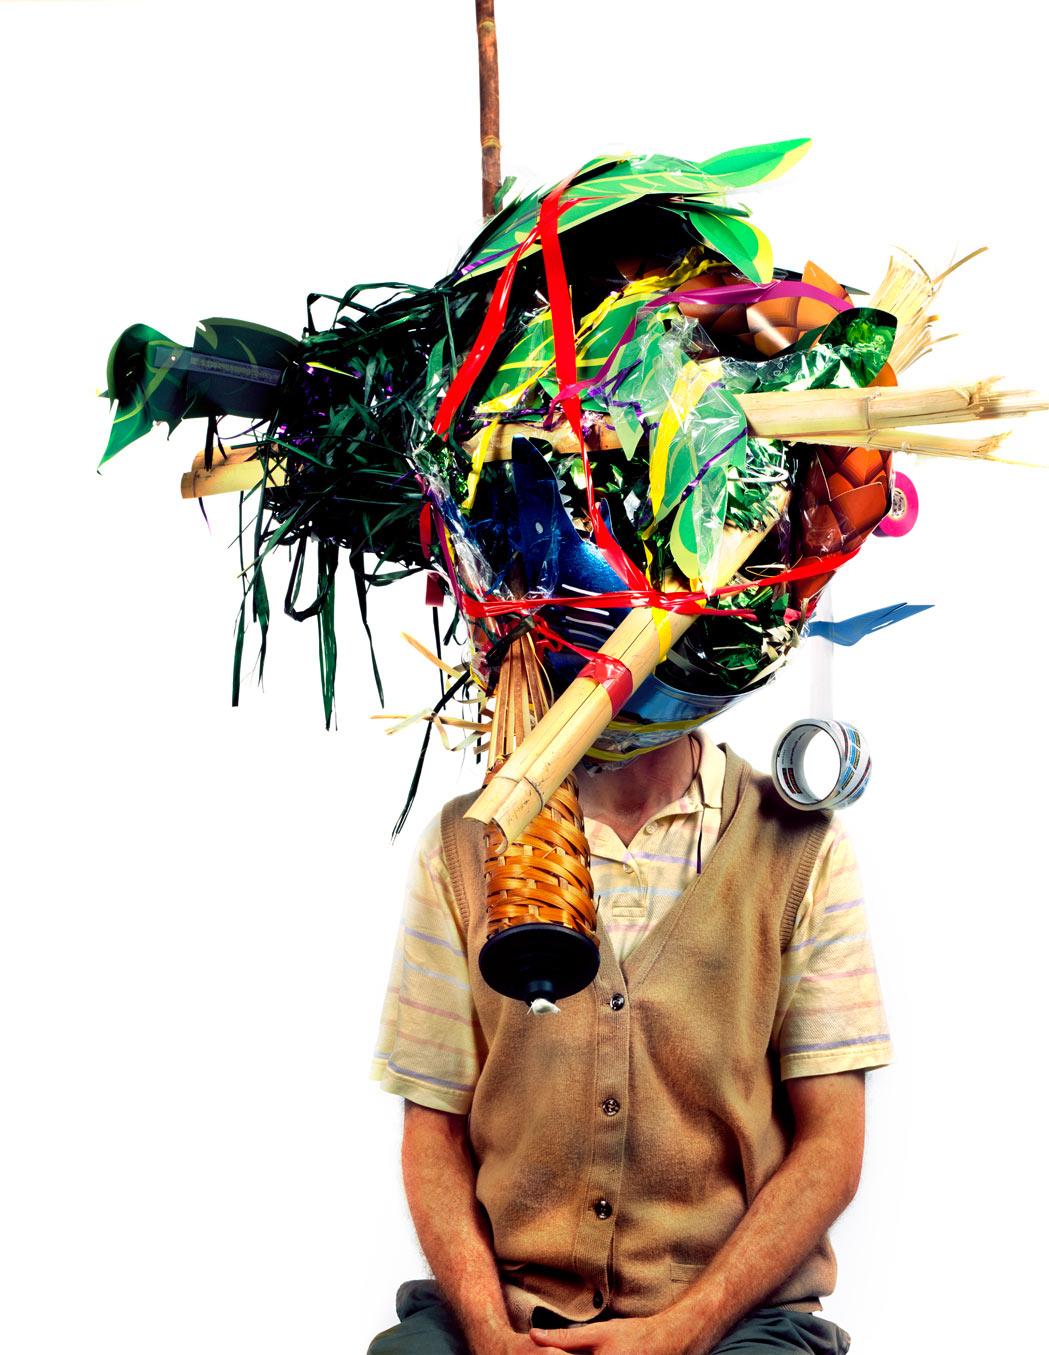 Untitled (tiki) 1 2009